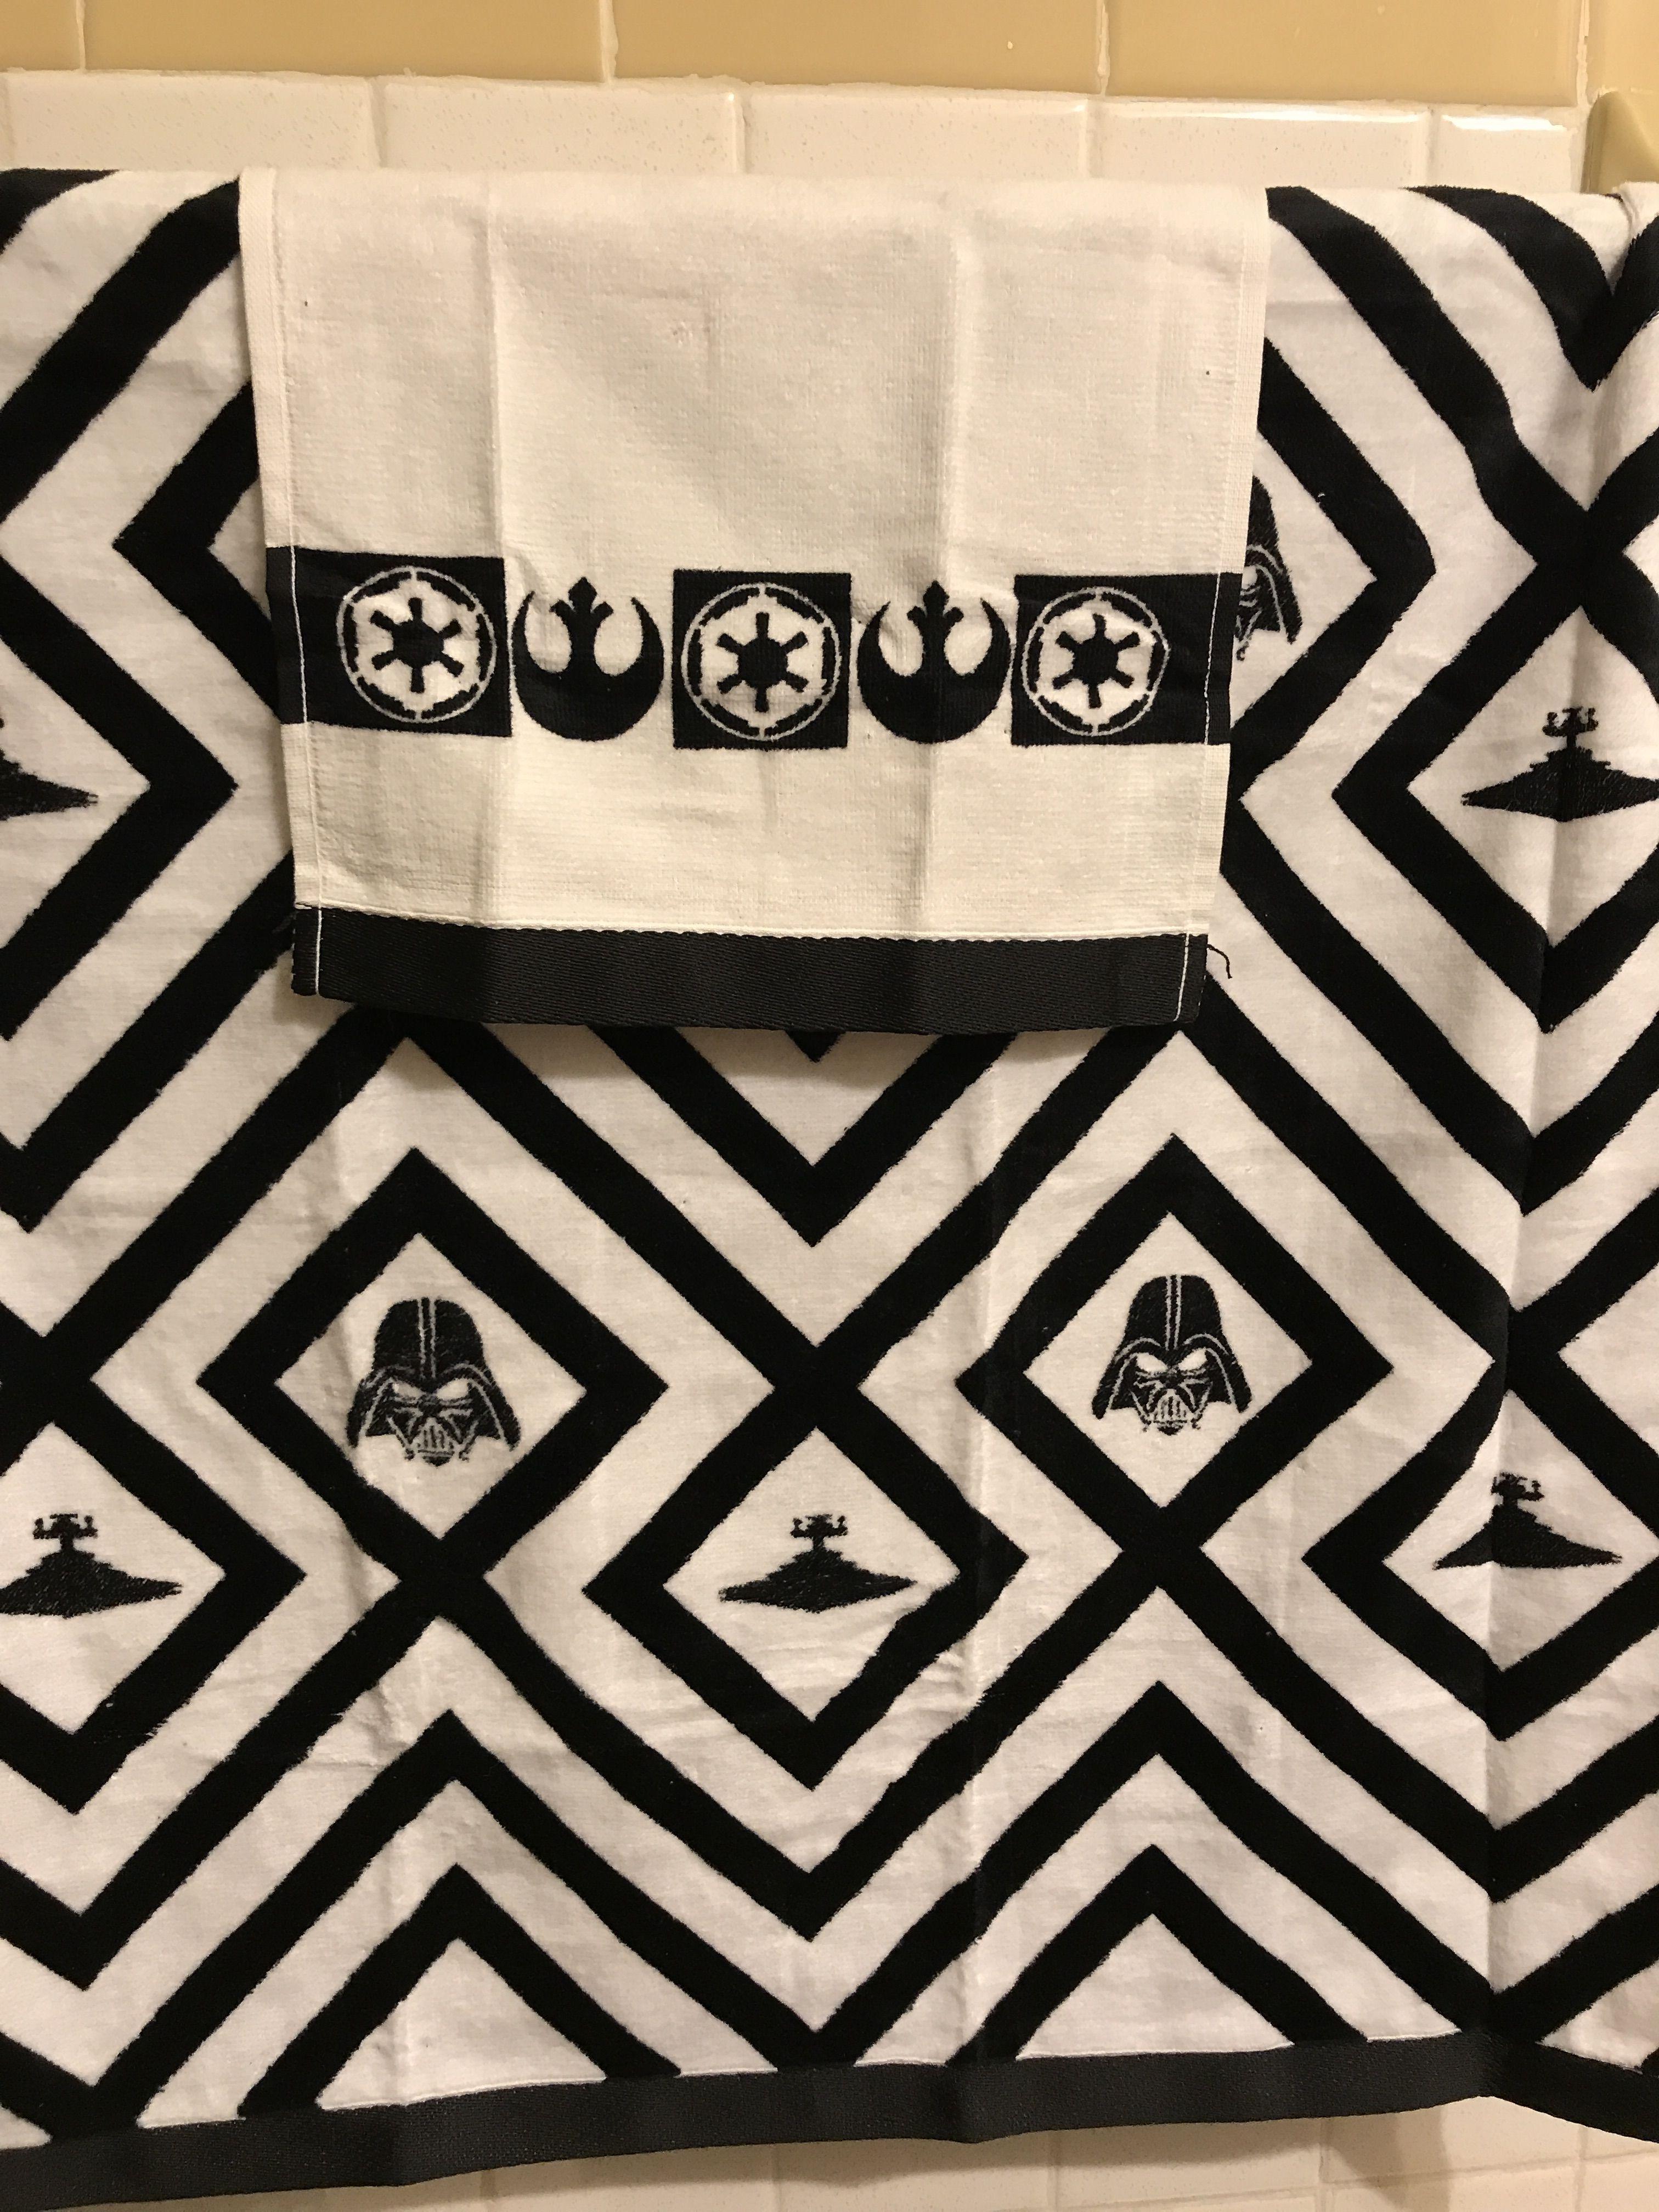 Star Wars towels bathroom decor | Animal print rug ...